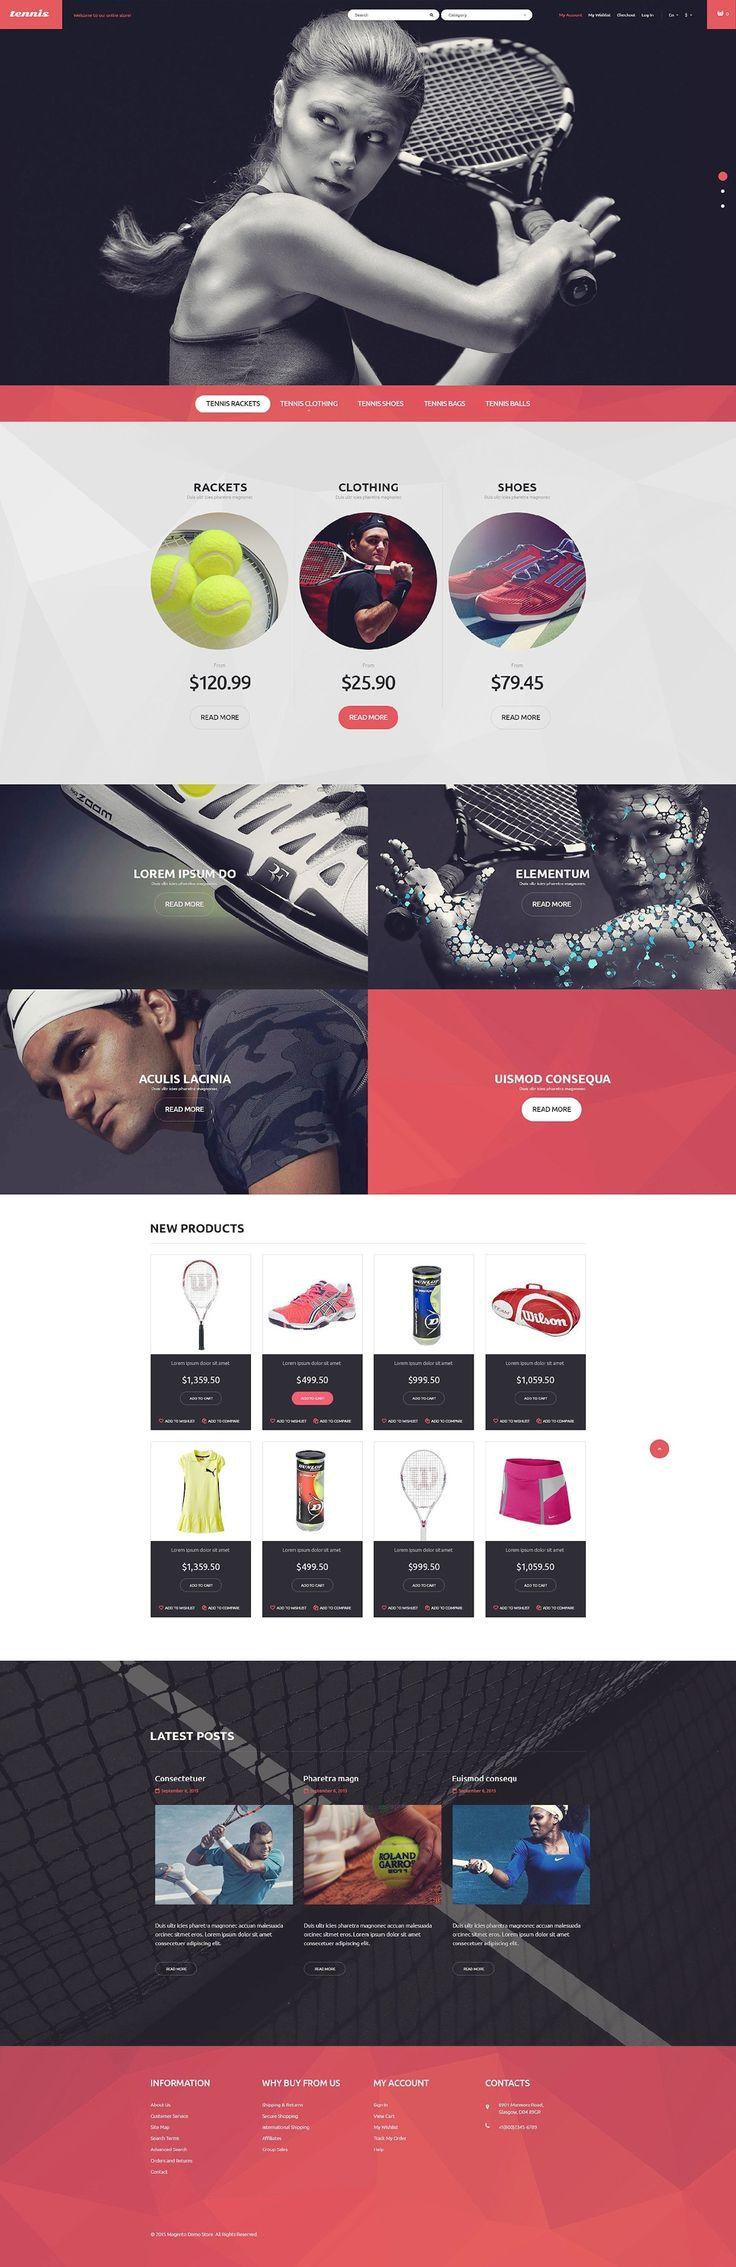 Tennis Equipment Magento Theme #website #template http://www.templatemonster.com/magento-themes/53506.html?utm_source=pinterest&utm_medium=timeline&utm_campaign=tenth